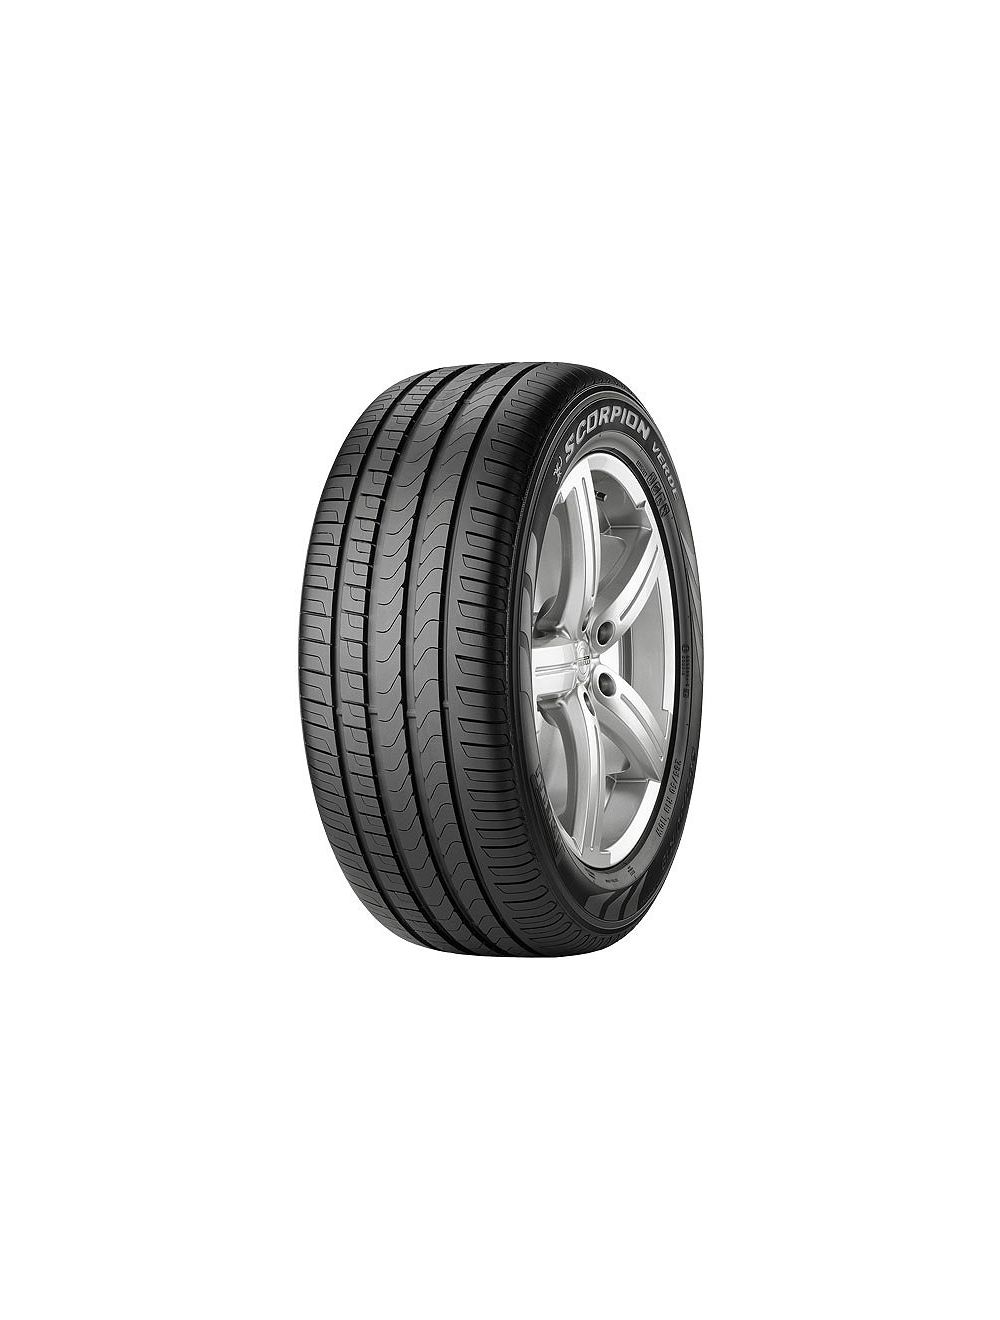 Pirelli 245/65R17 H Scorpion Verde XL Nyári gumi